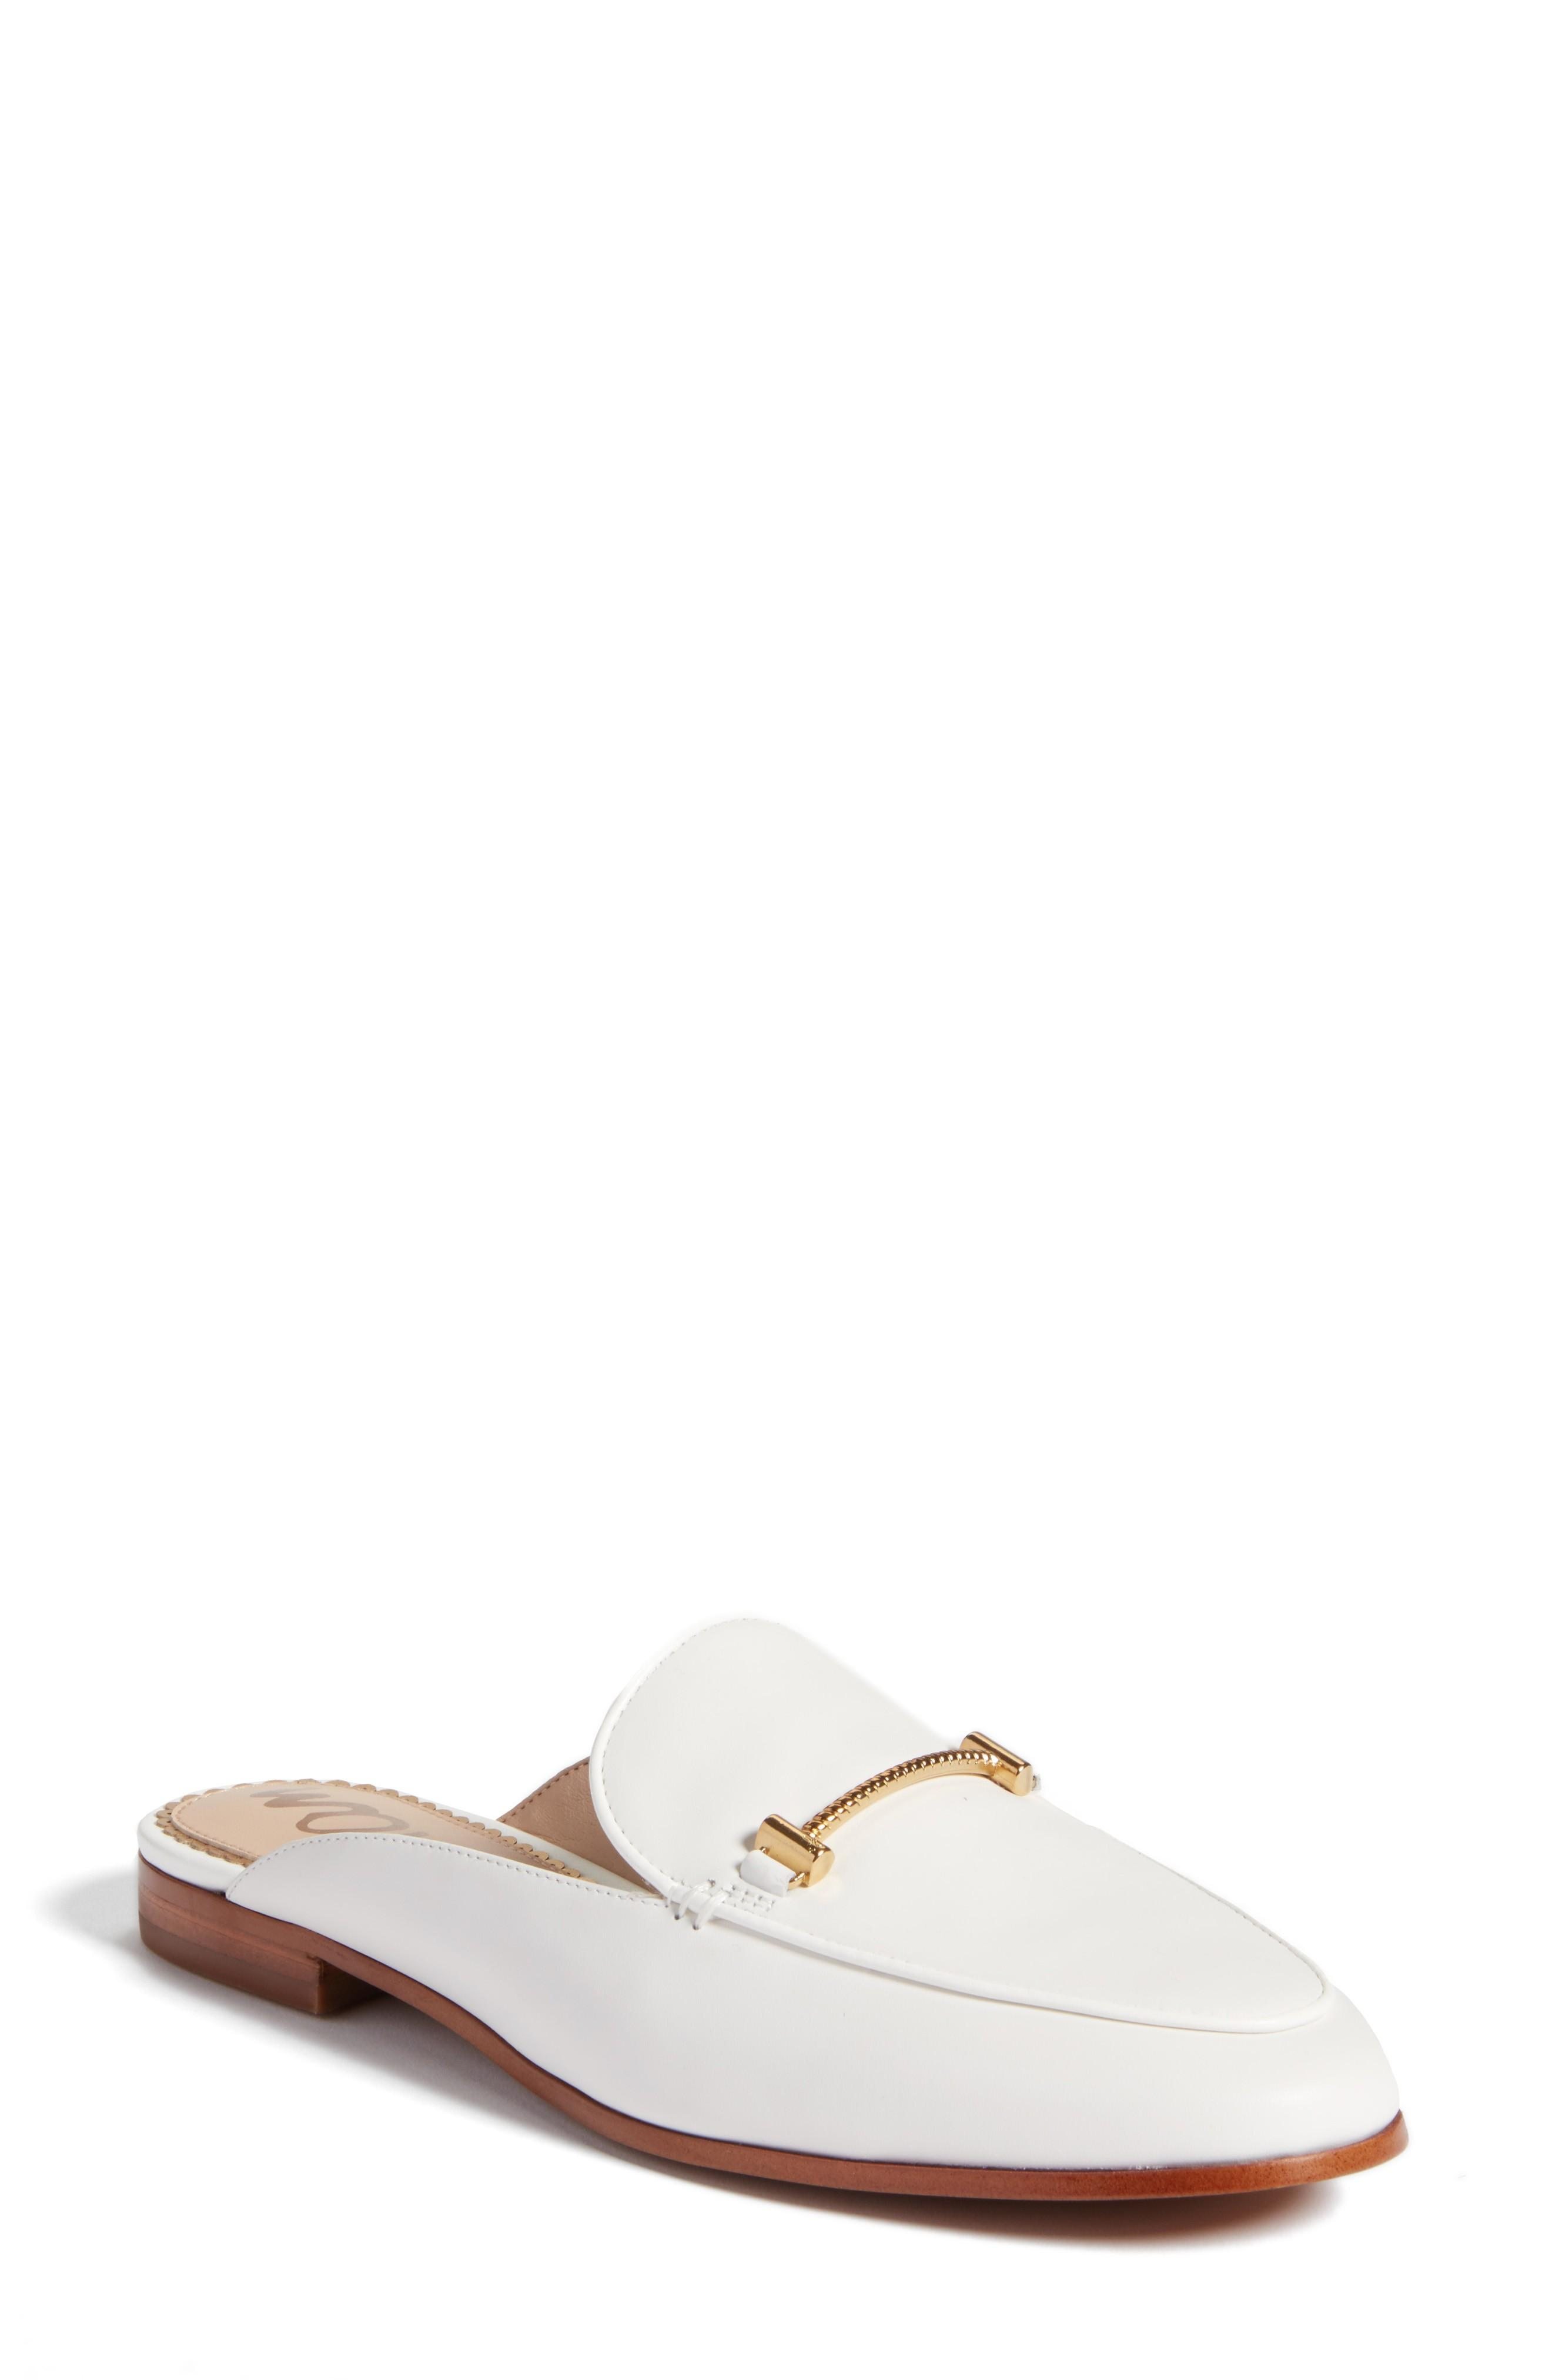 1eb71df242a Sam Edelman Laurna Mule In Bright White Leather